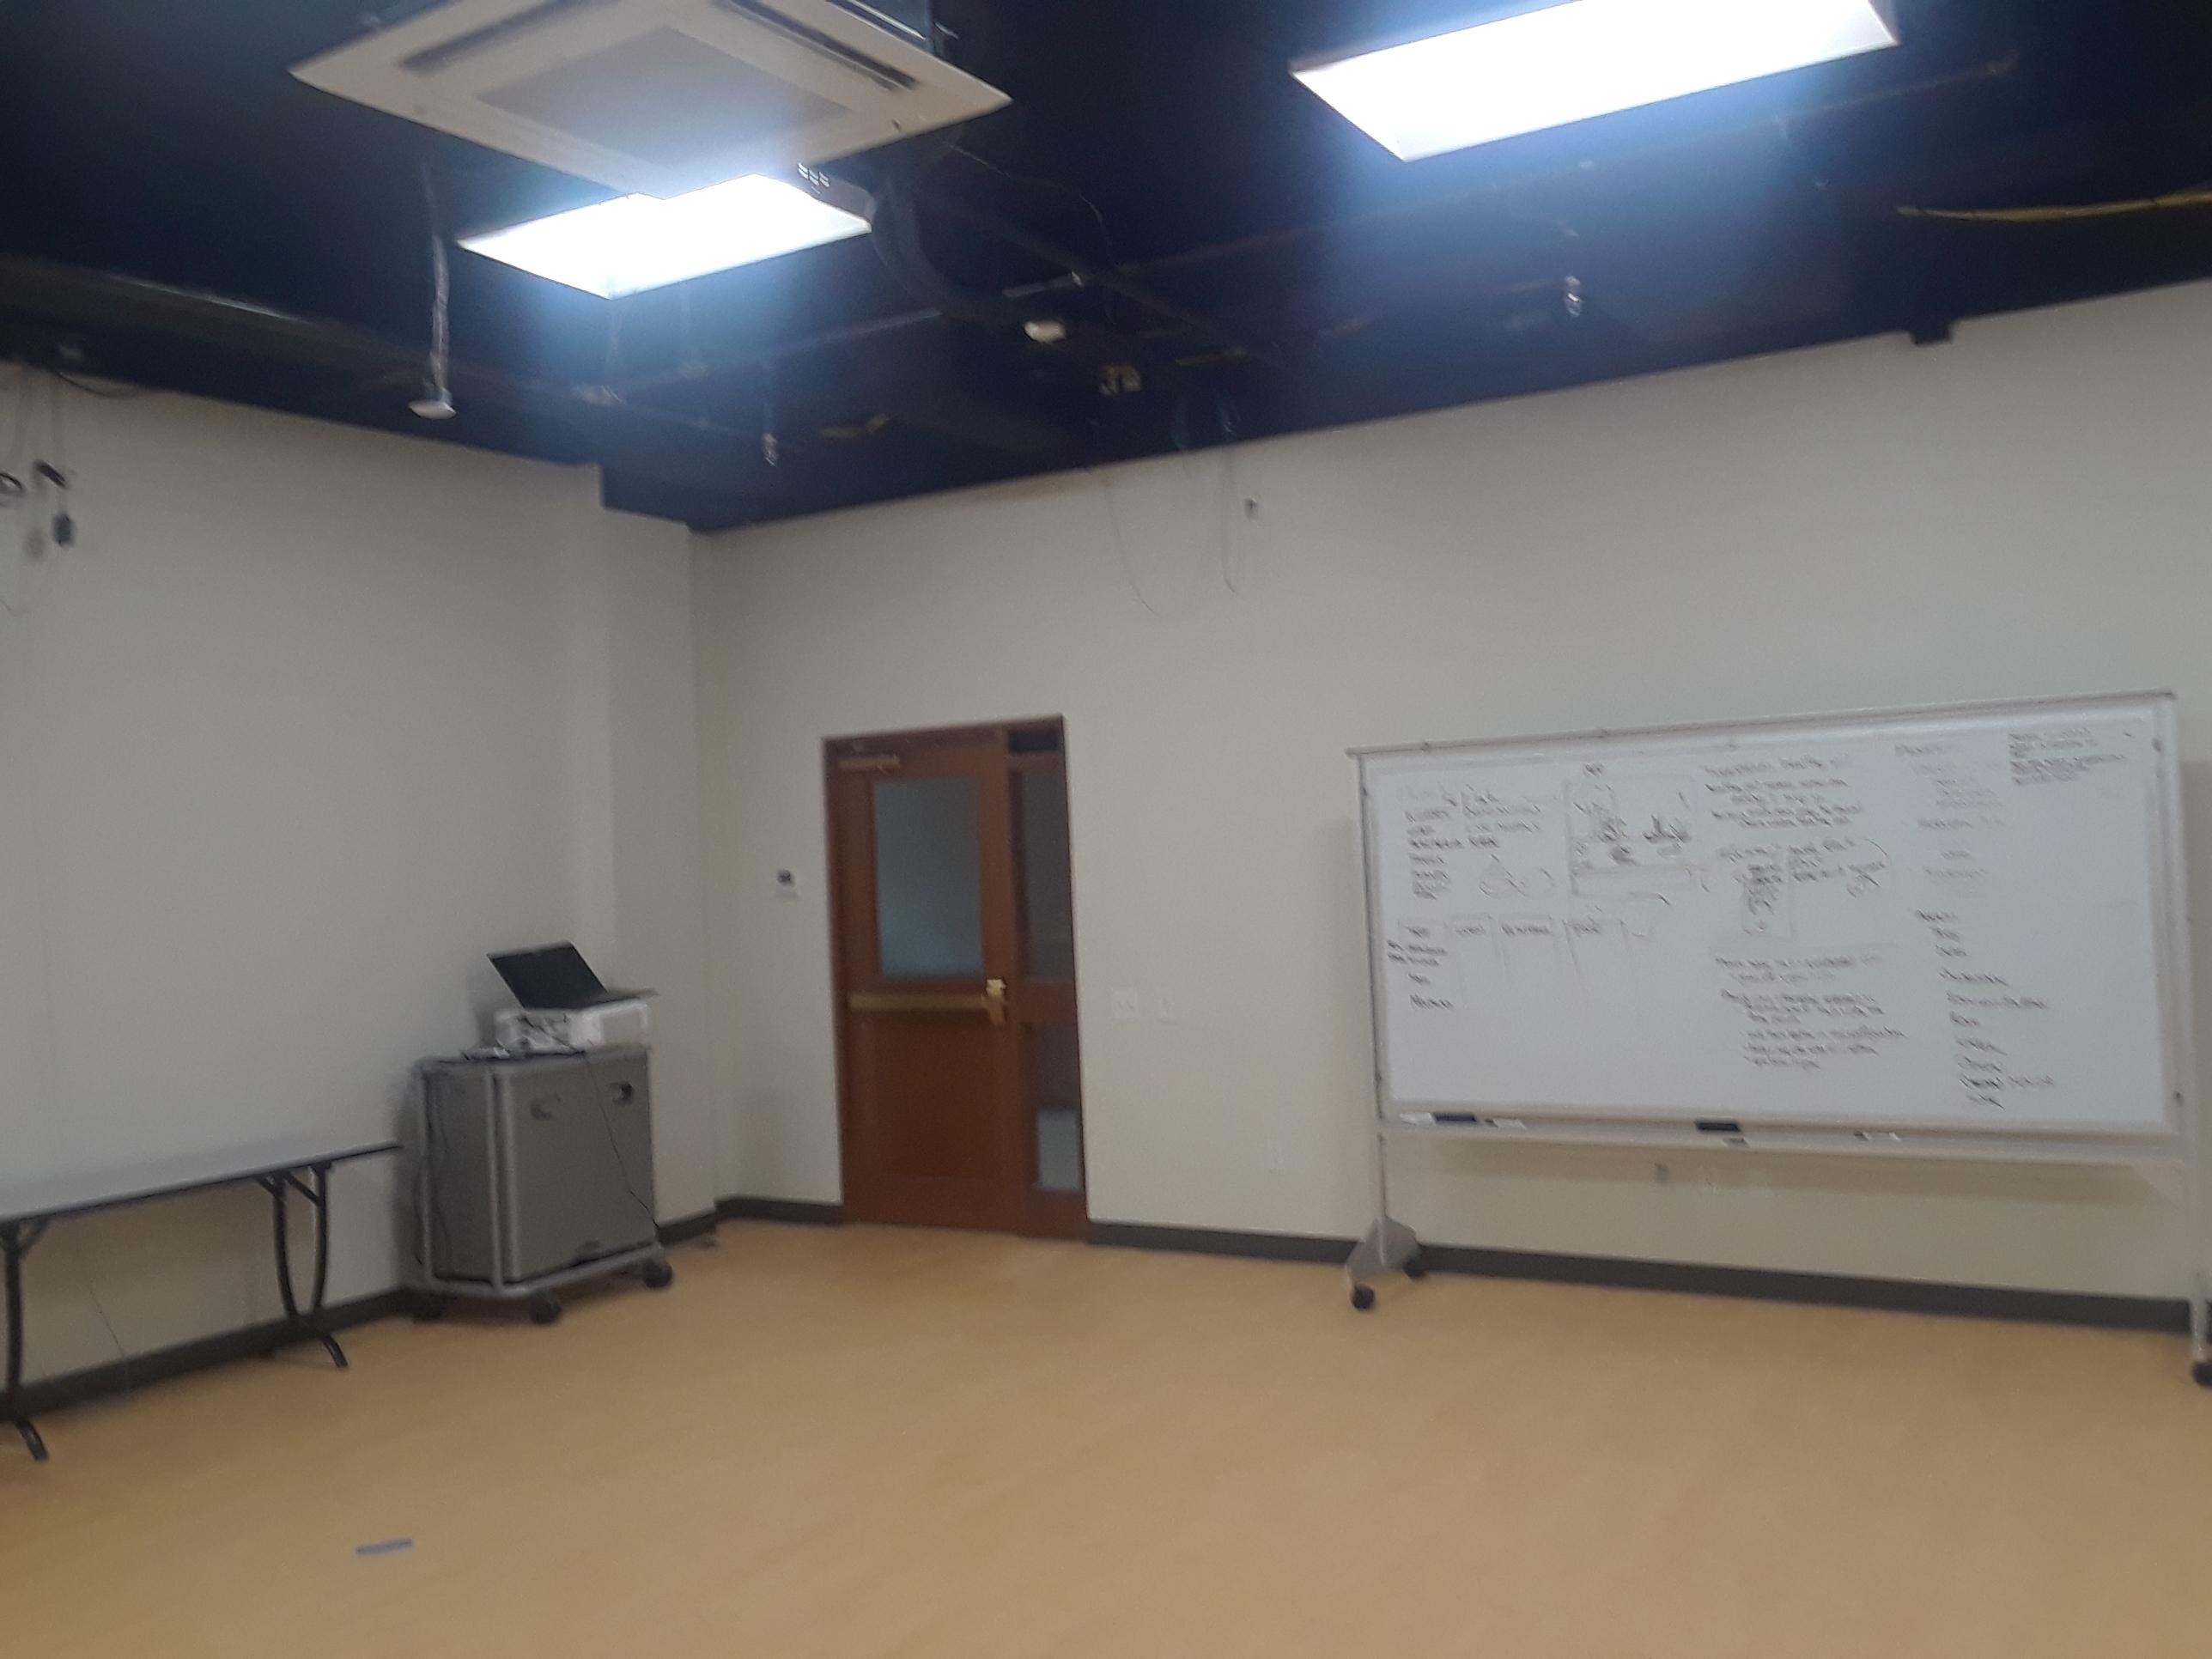 In-Progress Views of the Lab Space, Sony Building, Vanderbilt University